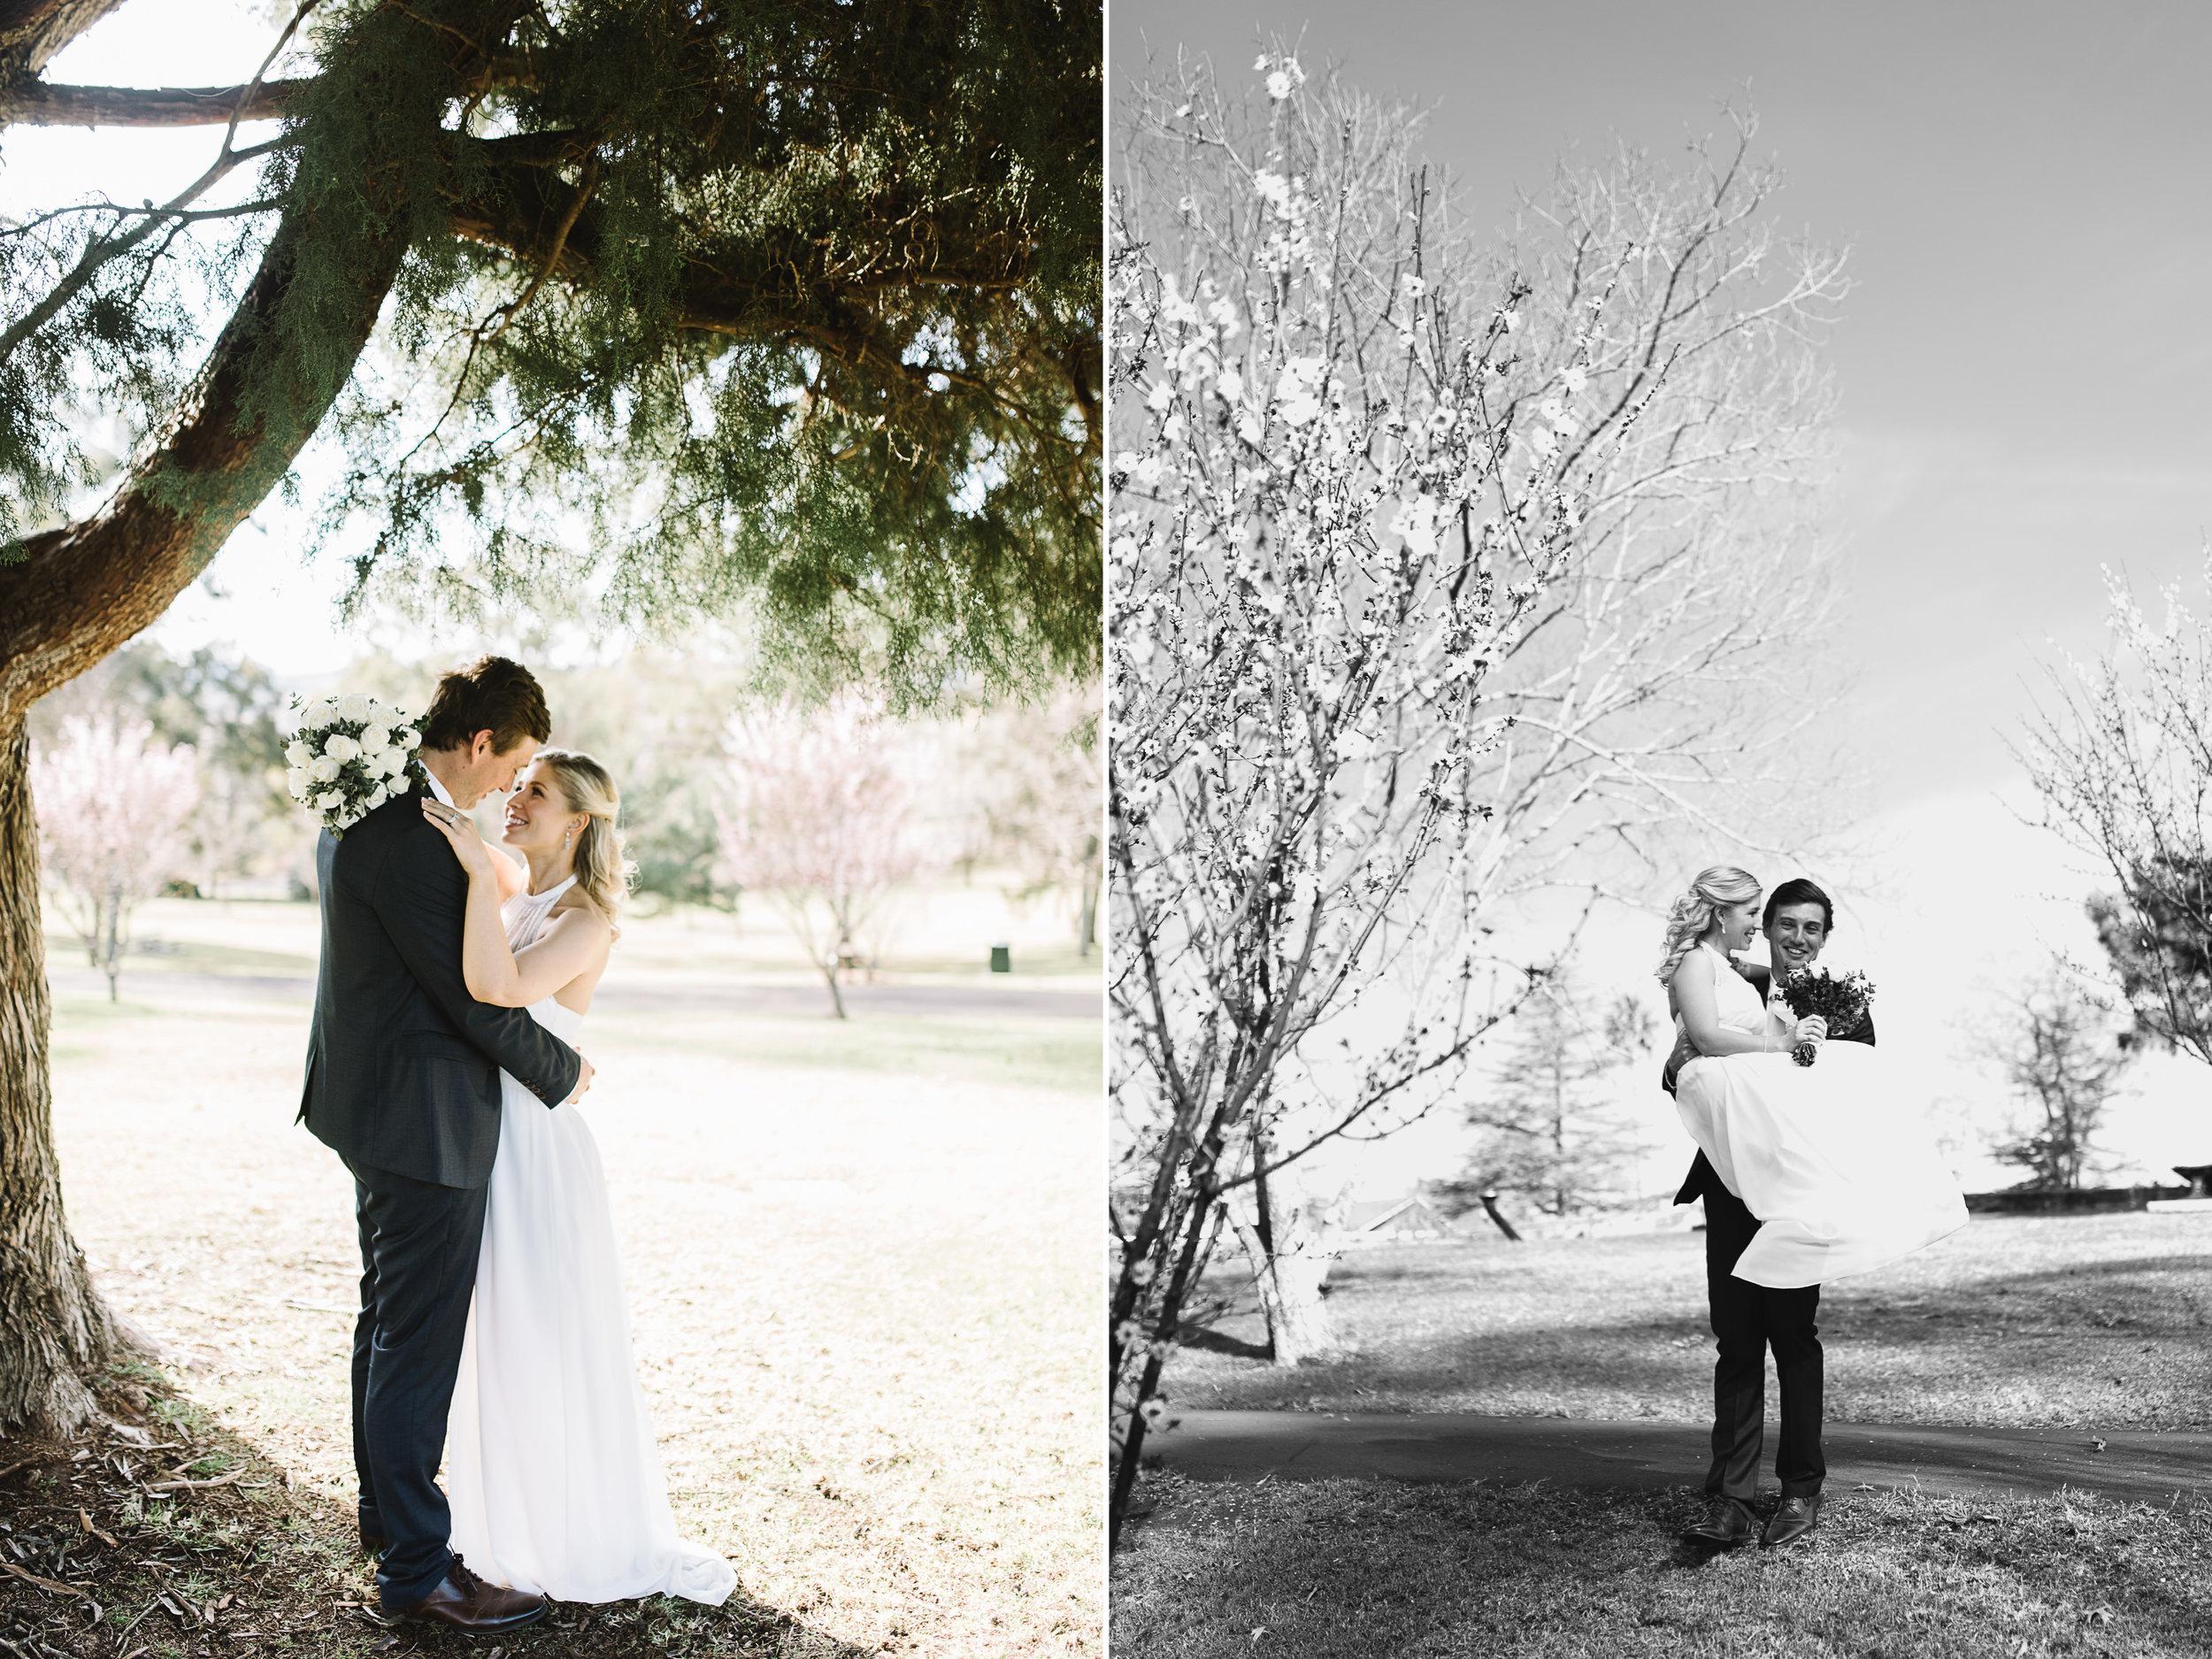 sydney-wedding-photographer-5.jpg